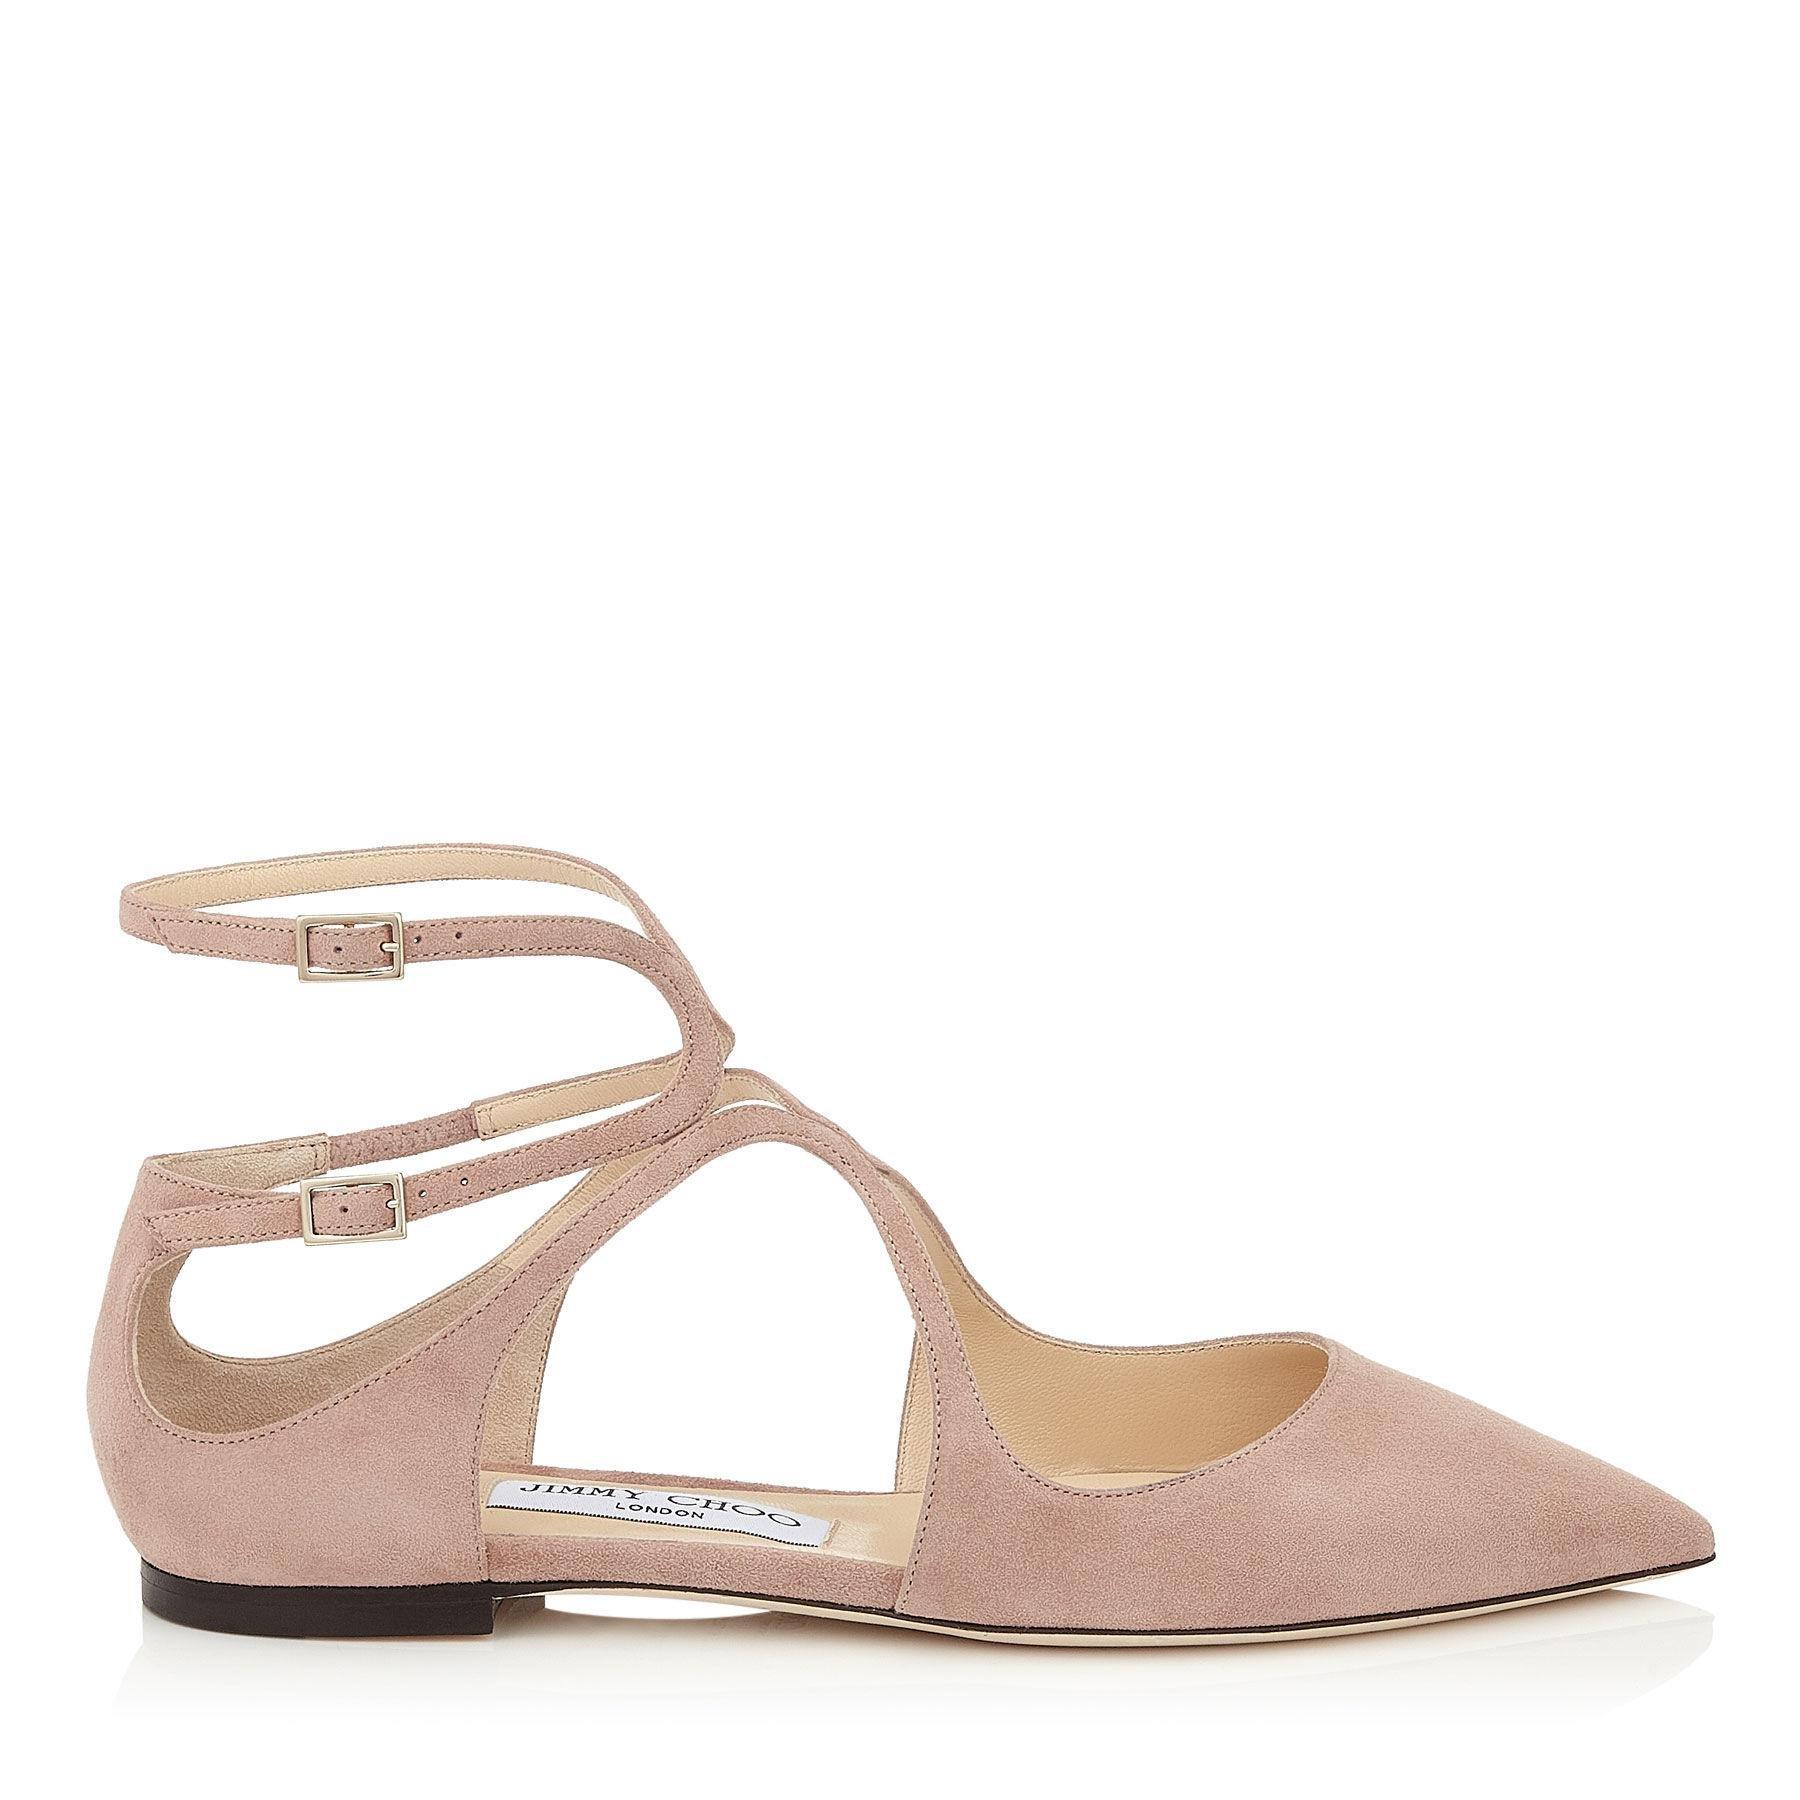 Afia Crystal-embellished Leather Sandals - Baby pink Jimmy Choo London AykLL1ZZr